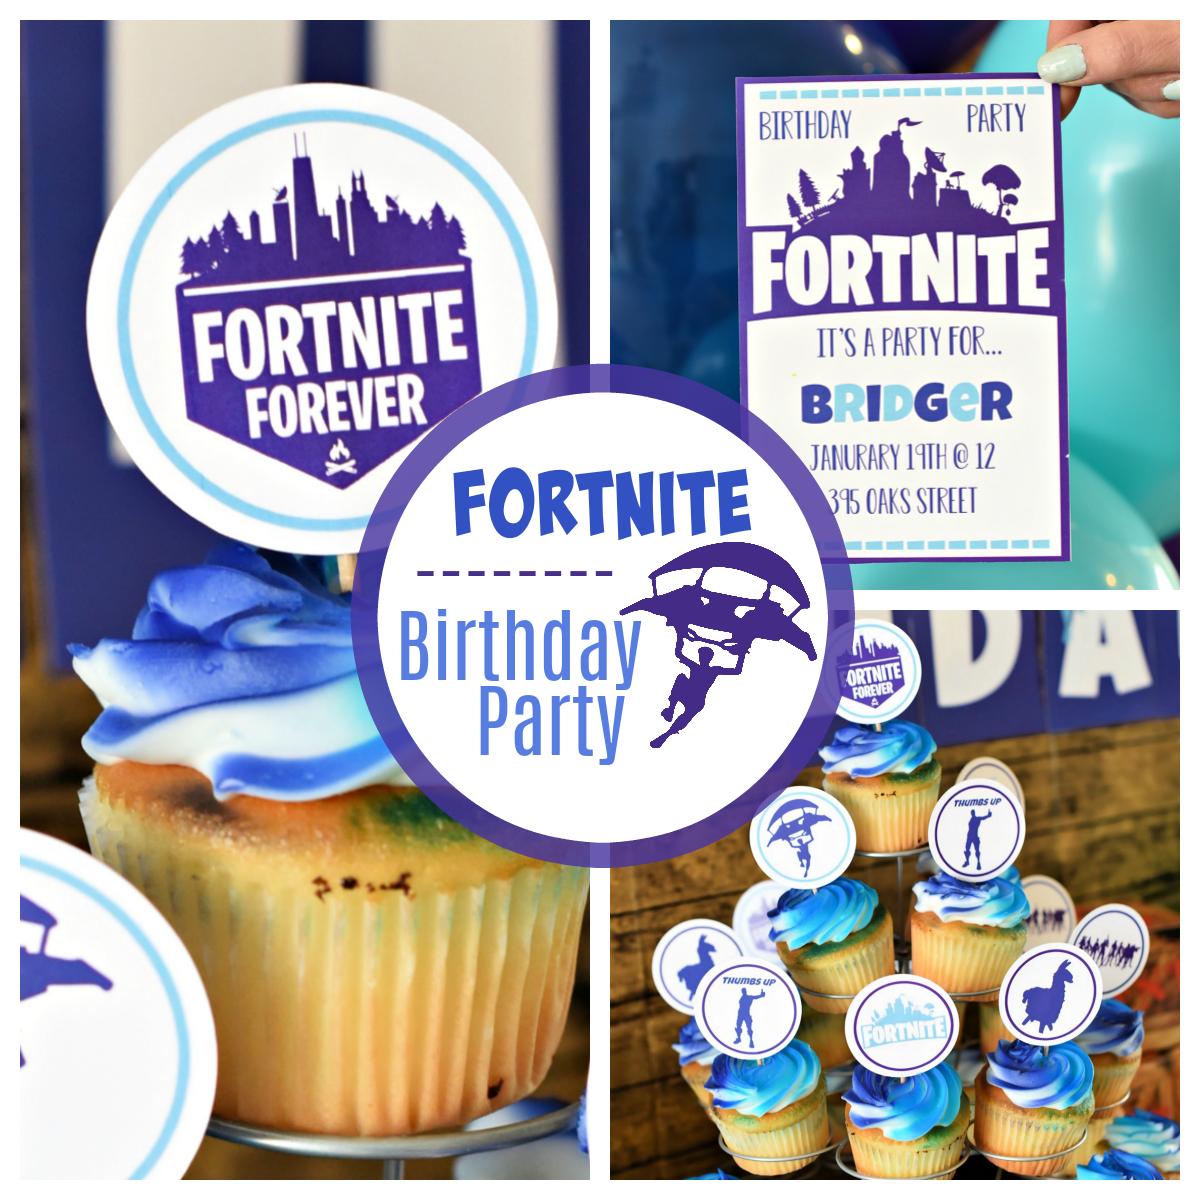 Fun Fortnite Birthday Party Fun Squared